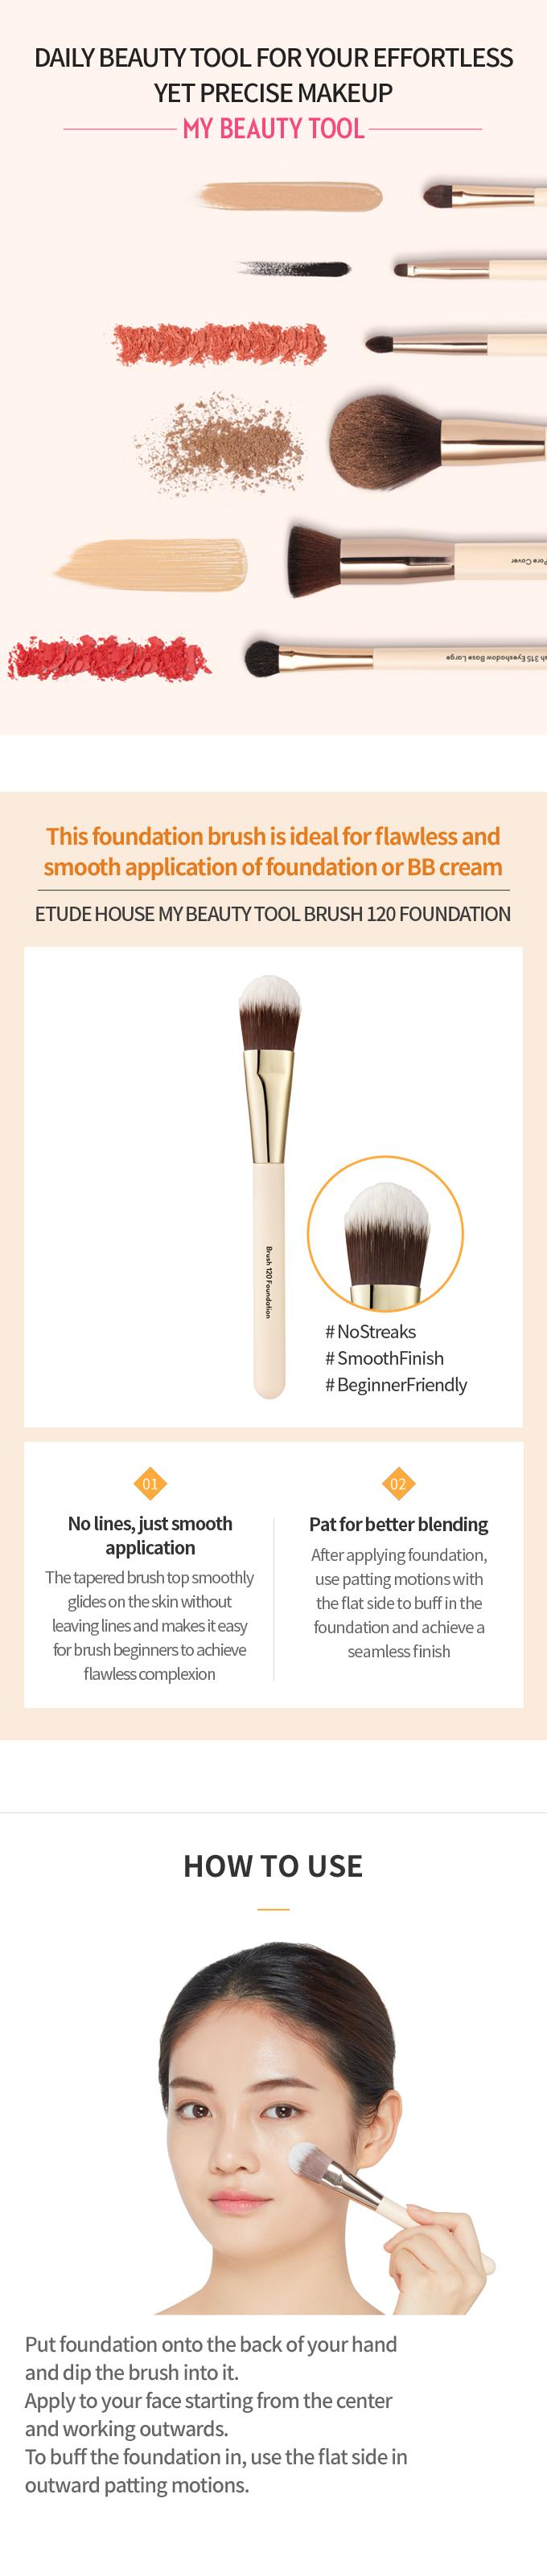 My Beauty Tool Brush 120 Foundation